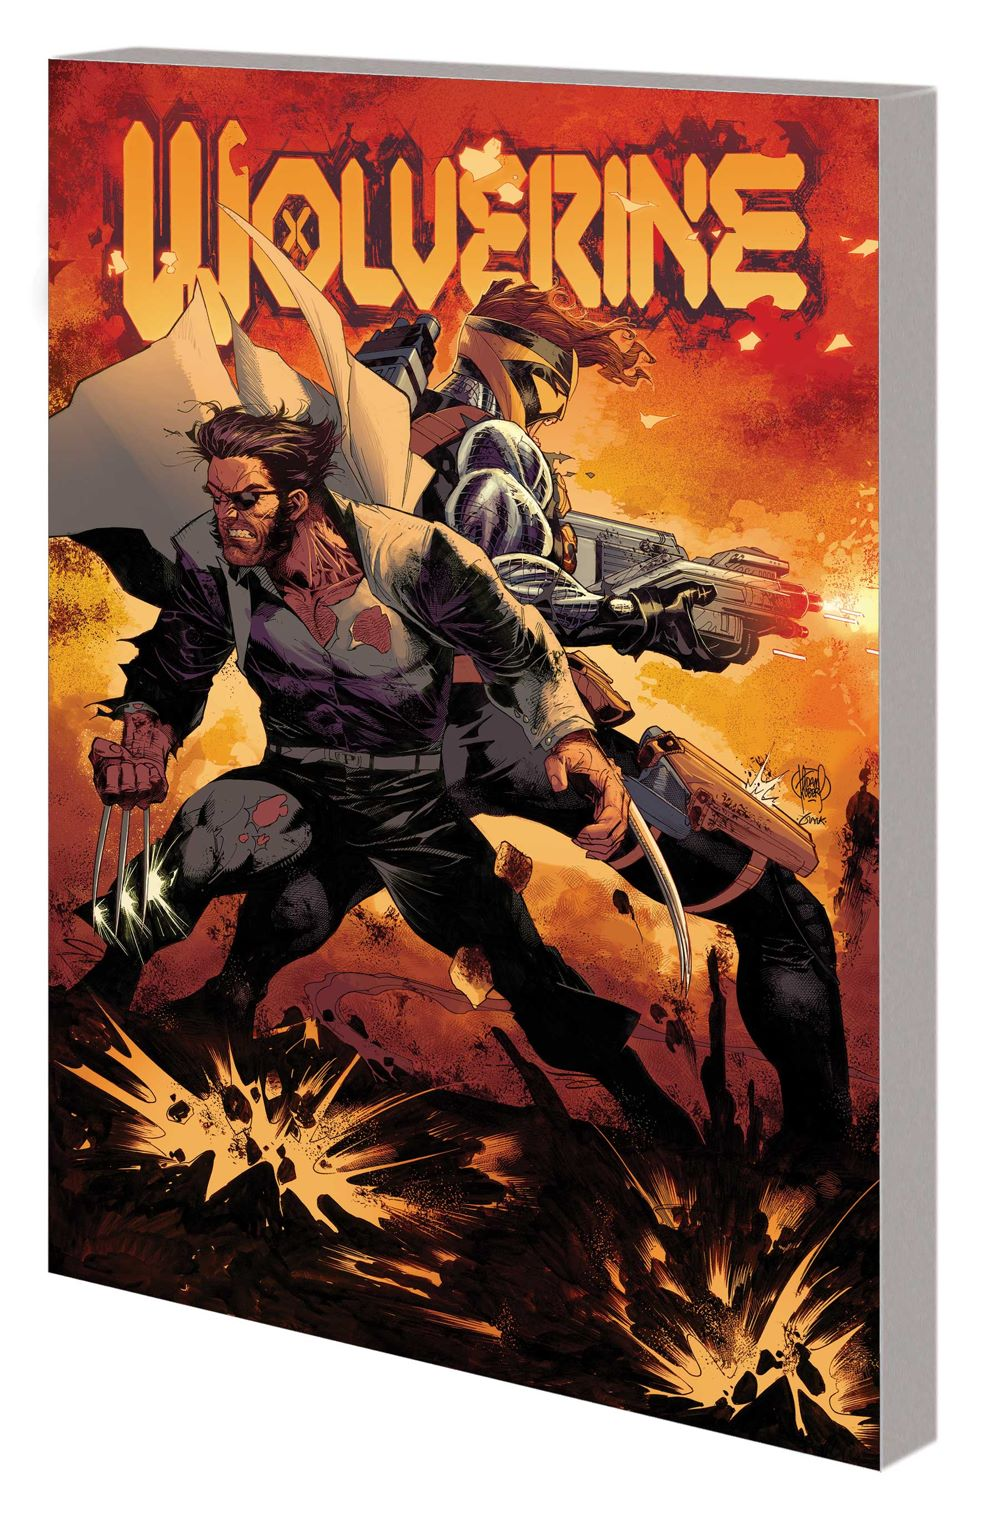 WOLV_VOL_2_TPB Marvel Comics August 2021 Solicitations